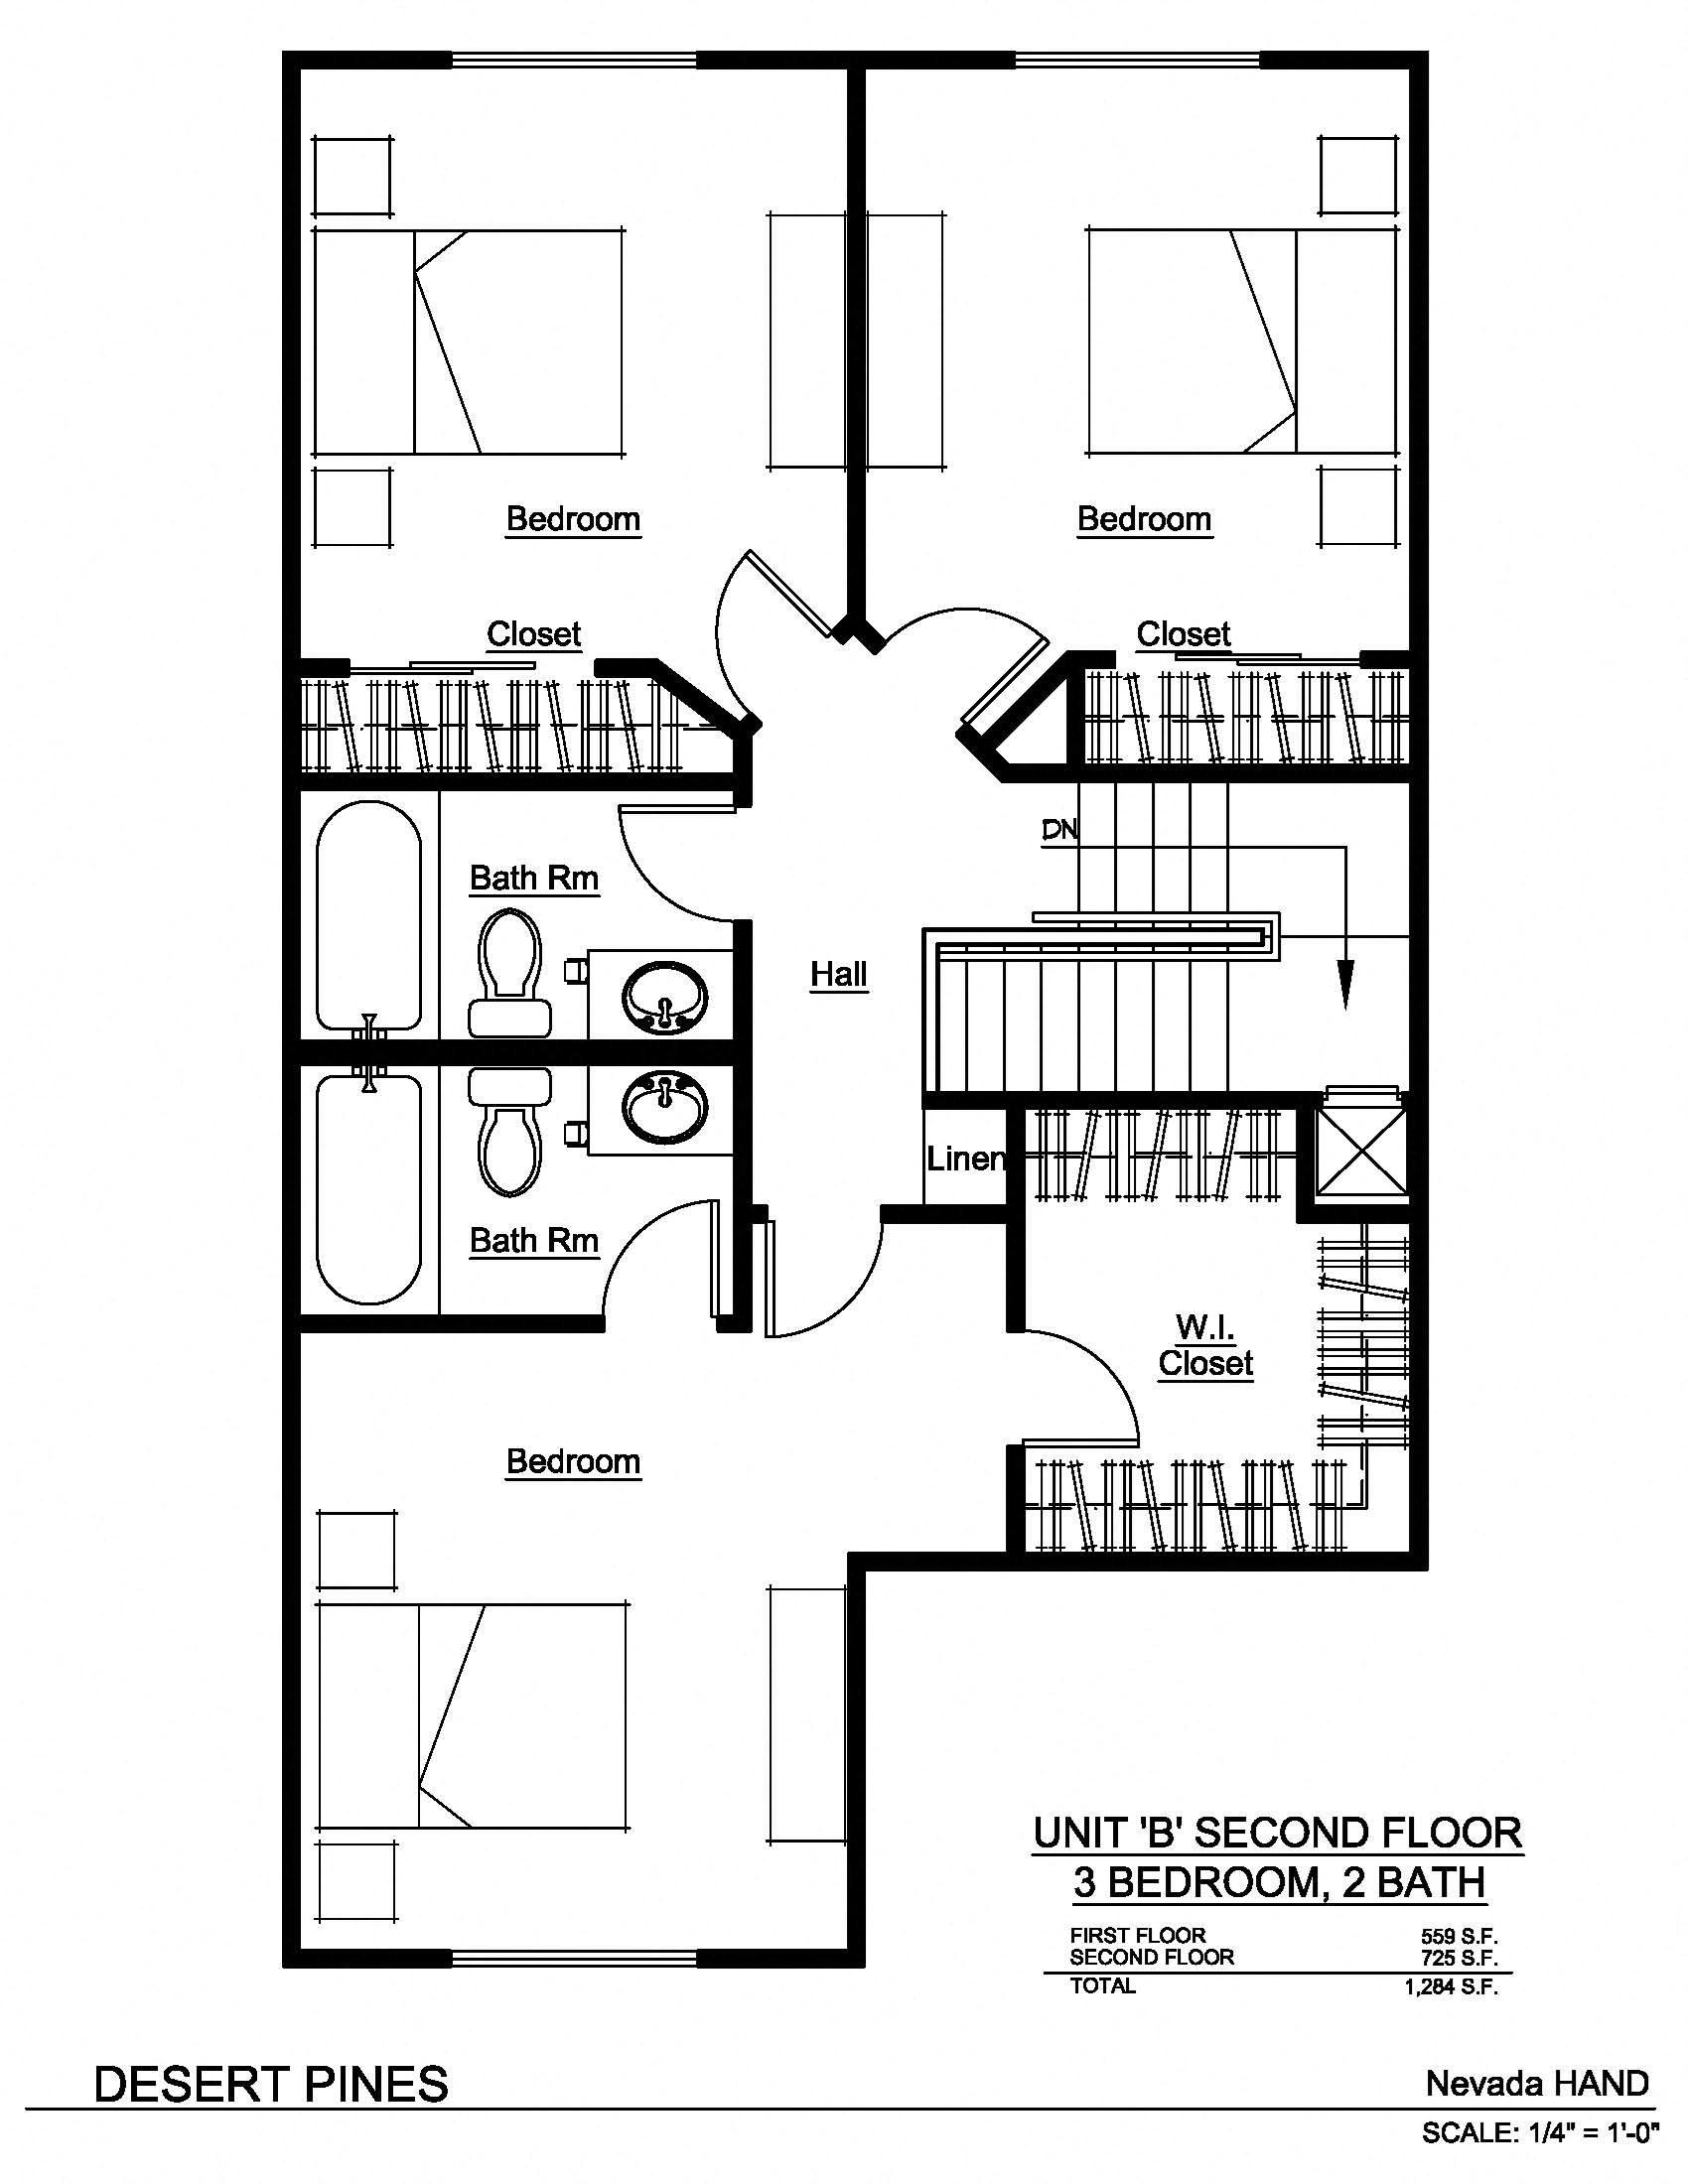 3_358980_1845898 Desert Pines House Plan on bonanza house plans, mountain view house plans, legacy house plans, lookout mountain house plans, las vegas house plans, basic house plans, eagle ridge house plans, tuscan house plans,